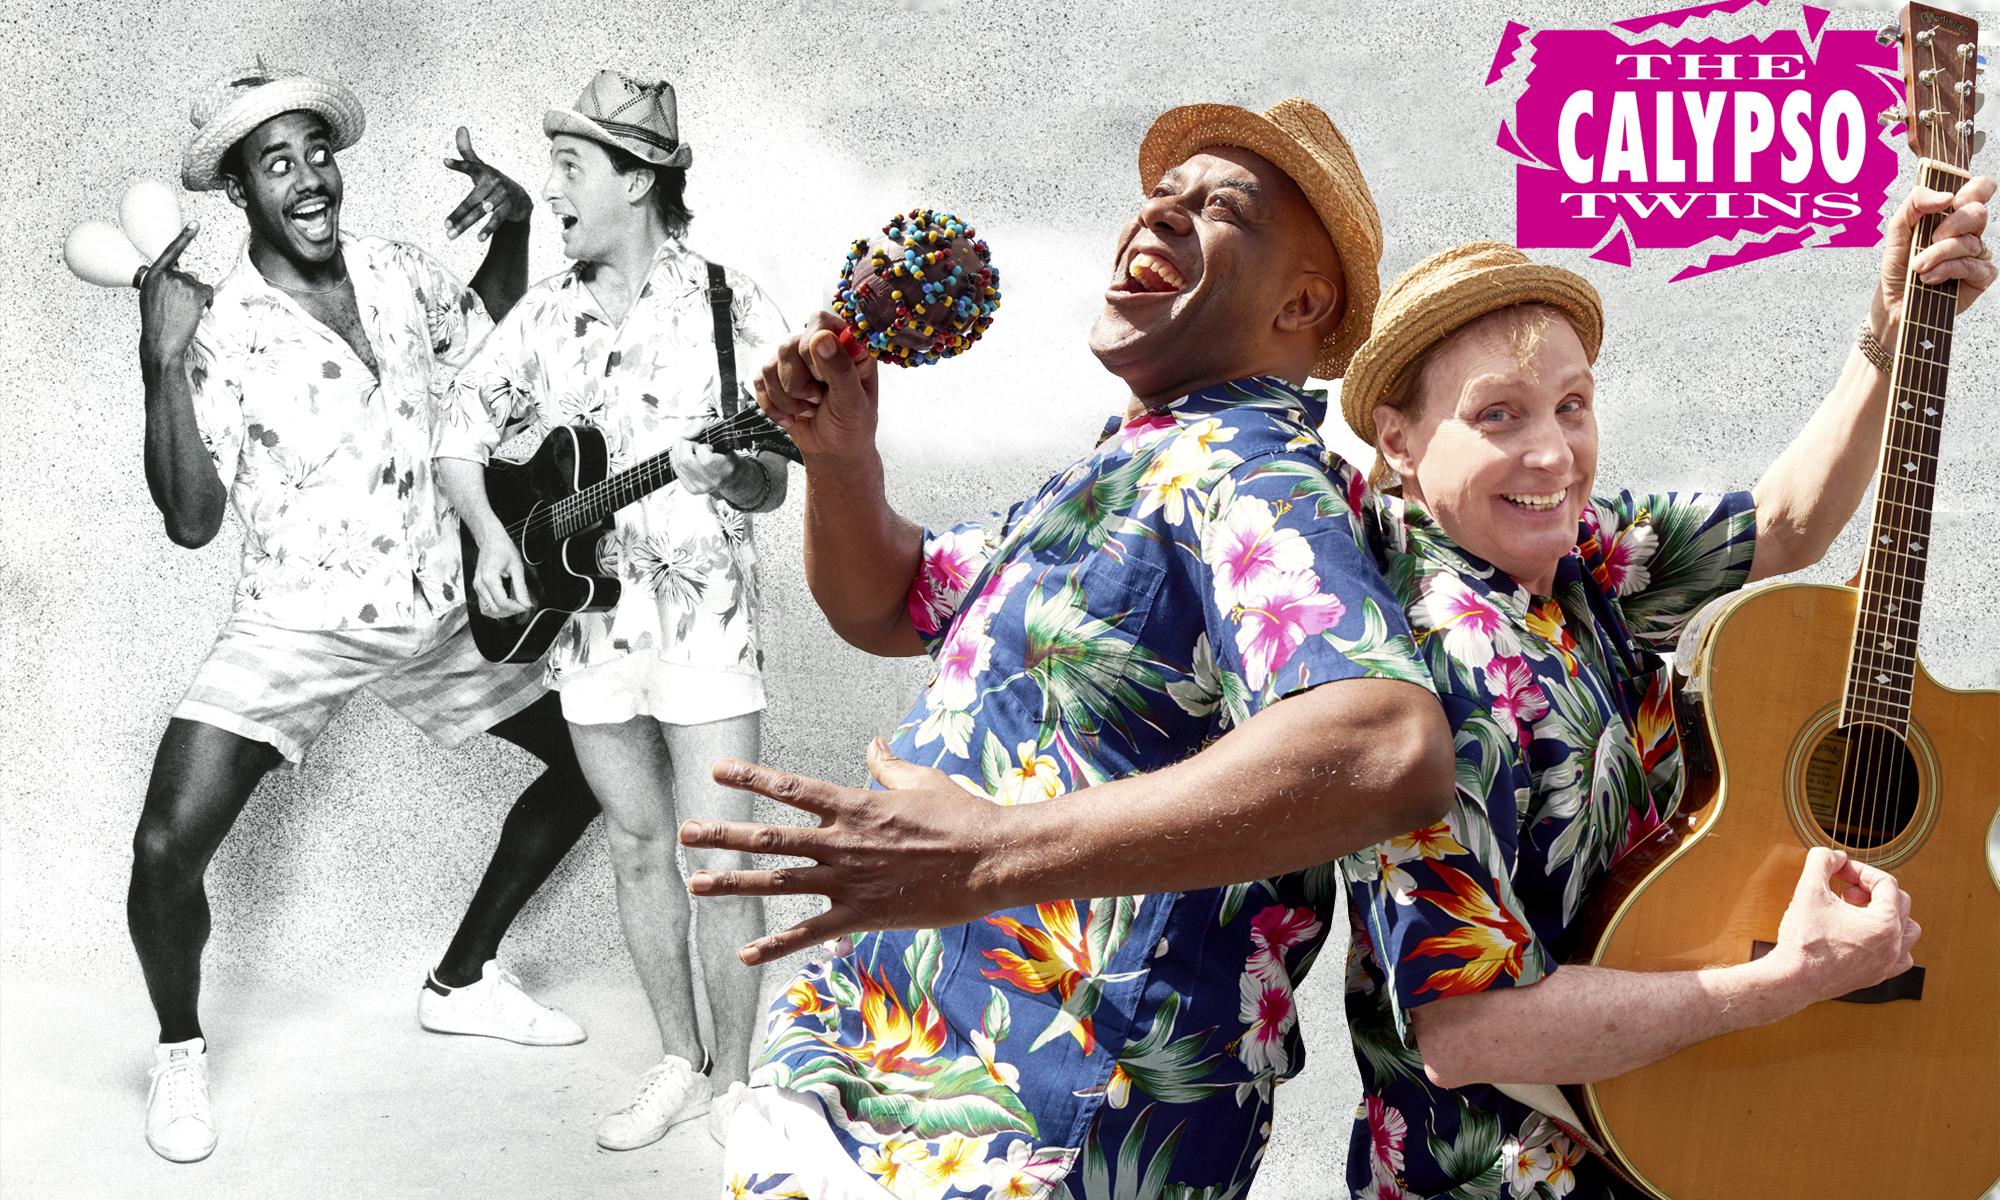 1989 - 2019 - 30 years of The Calypso Twins